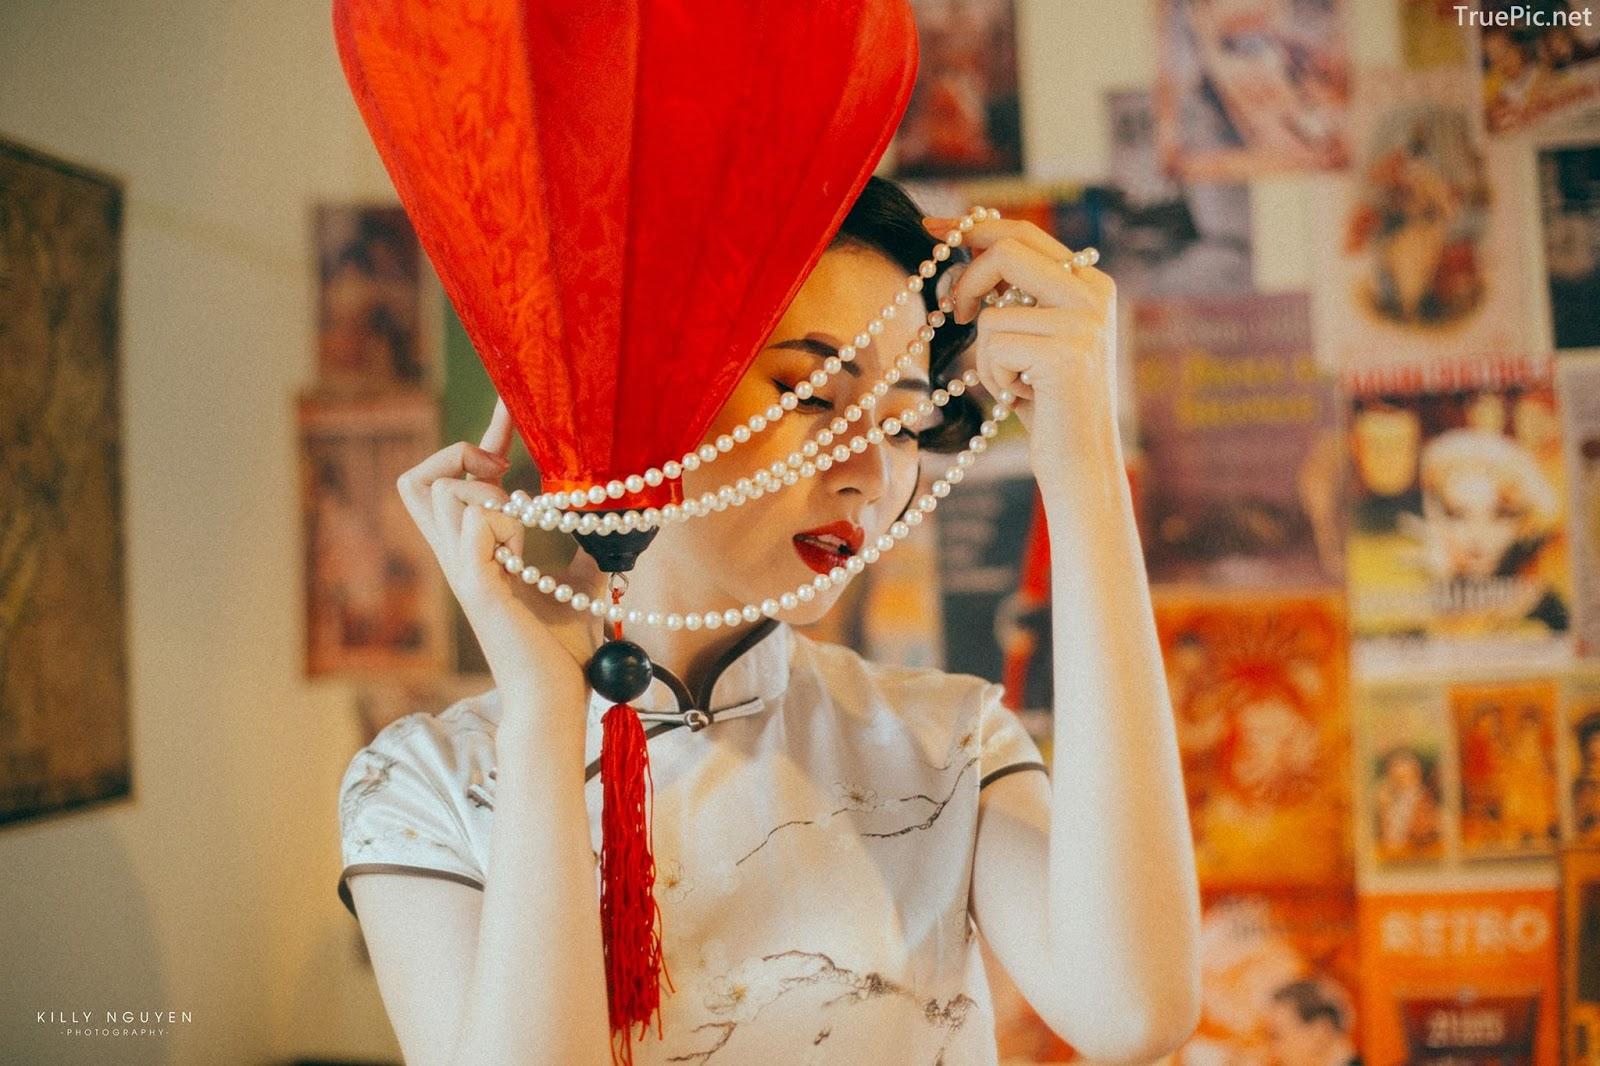 Vietnamese model Lan Huong - Lost in ShangHai - Photo by Killy Nguyen - TruePic.net - Picture 7